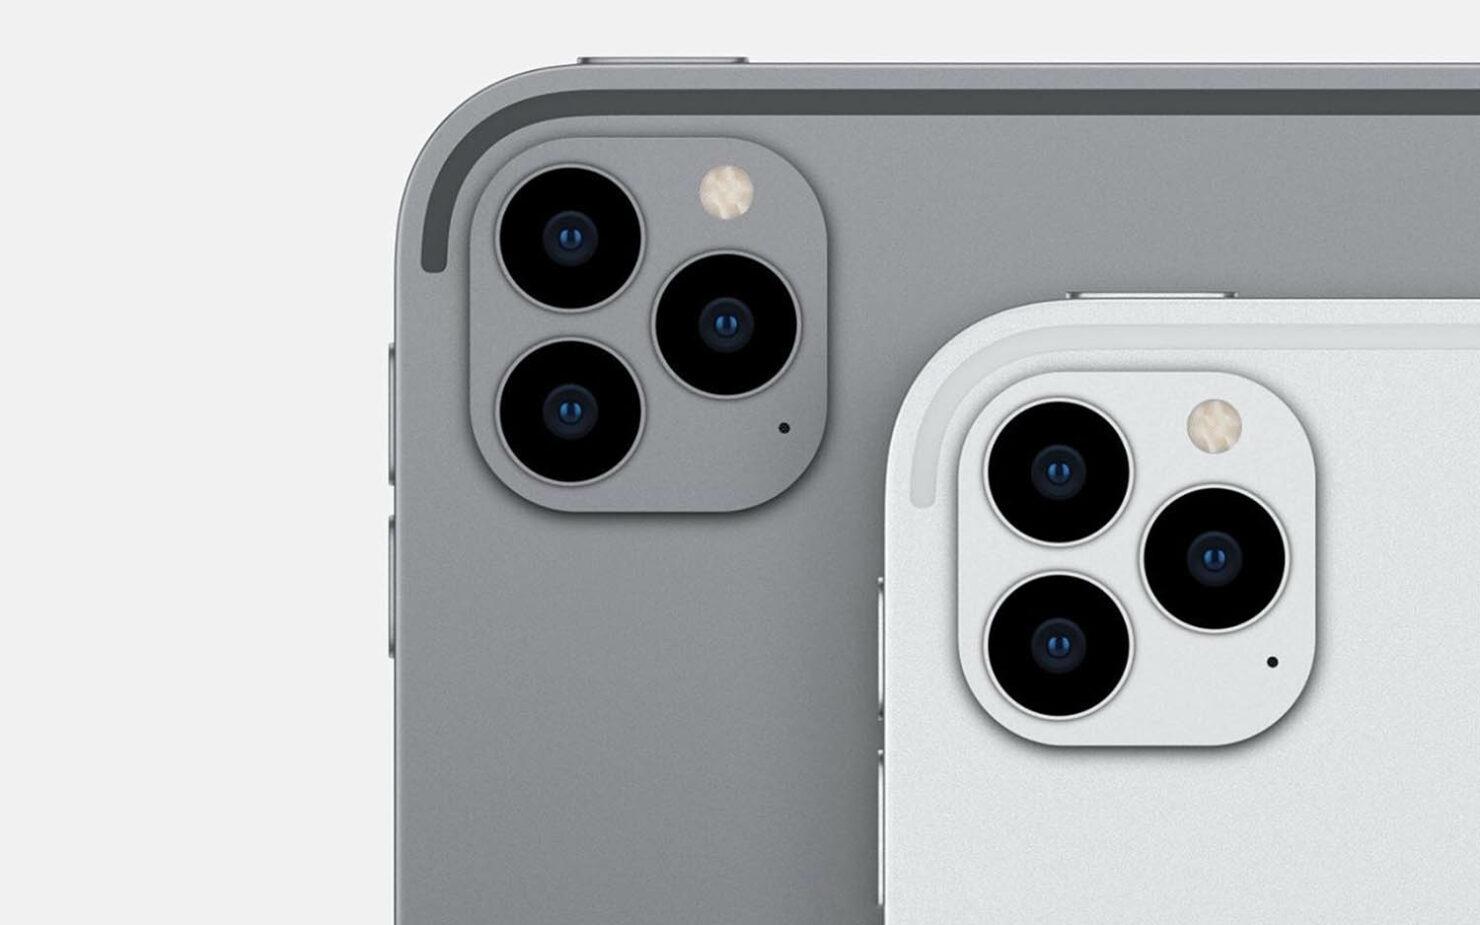 iPhone 12 Camera Hardware Rumored to Have Sensor-Shift Stabilization